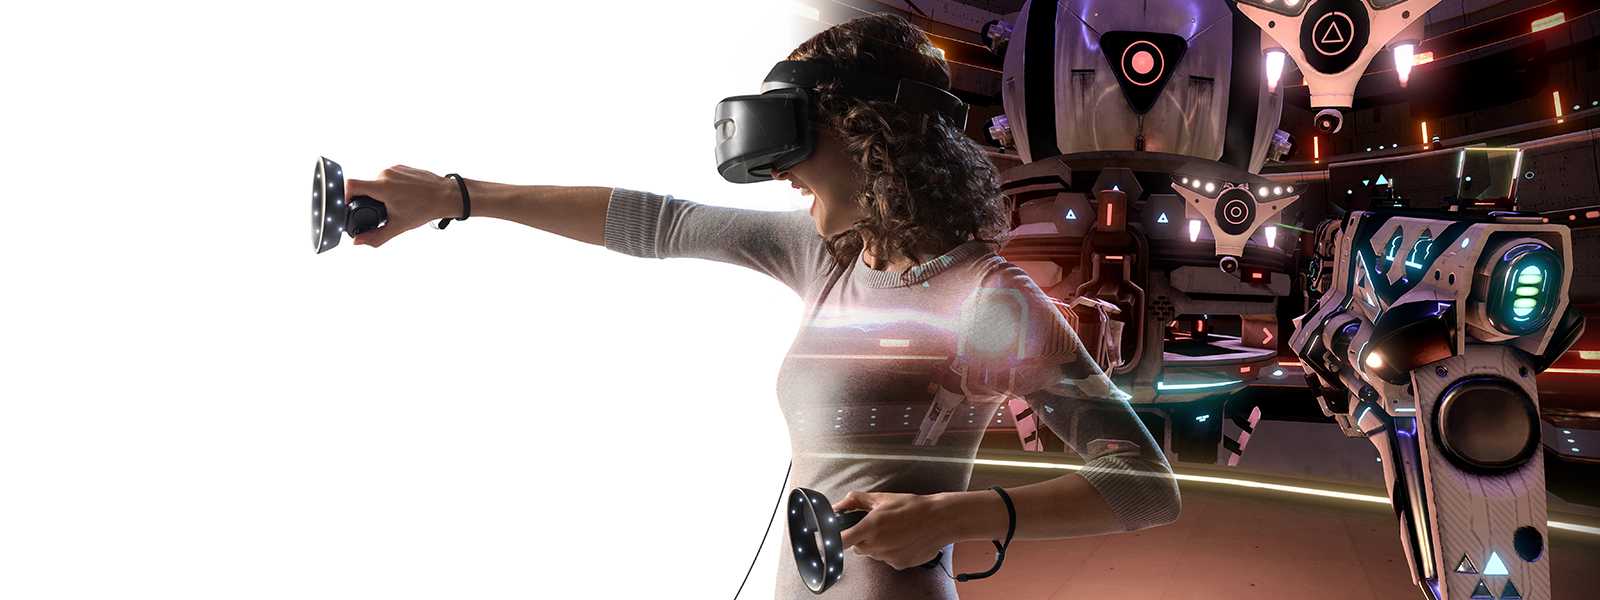 女人使用 Windows Mixed Reality 硬件玩《Space Pirate Trainer》游戏